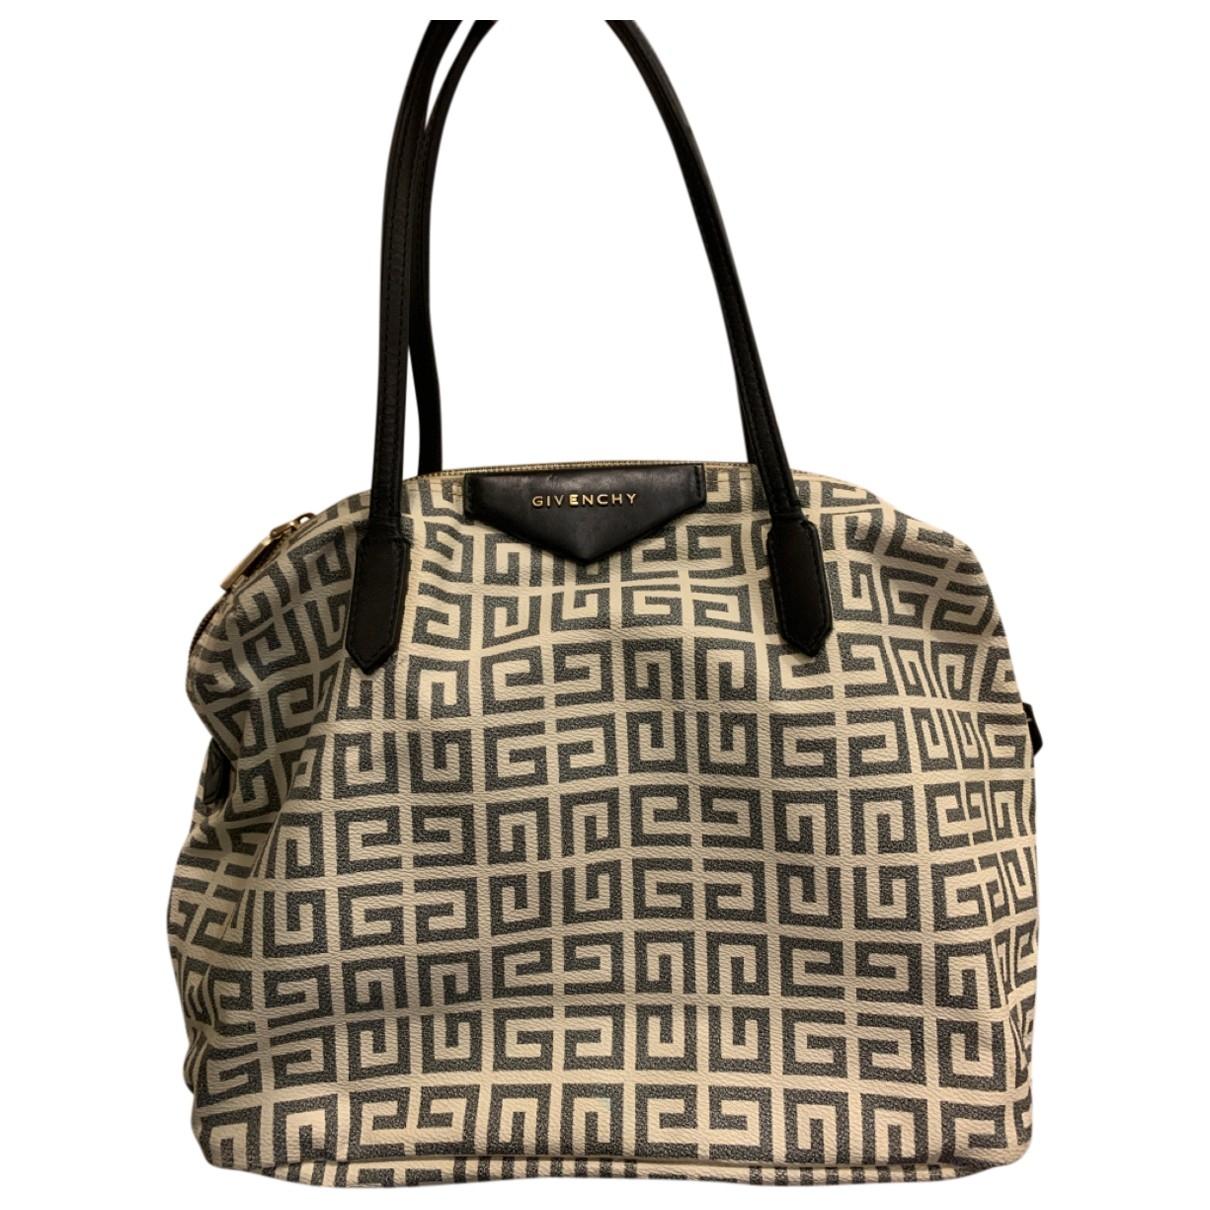 Givenchy \N White handbag for Women \N